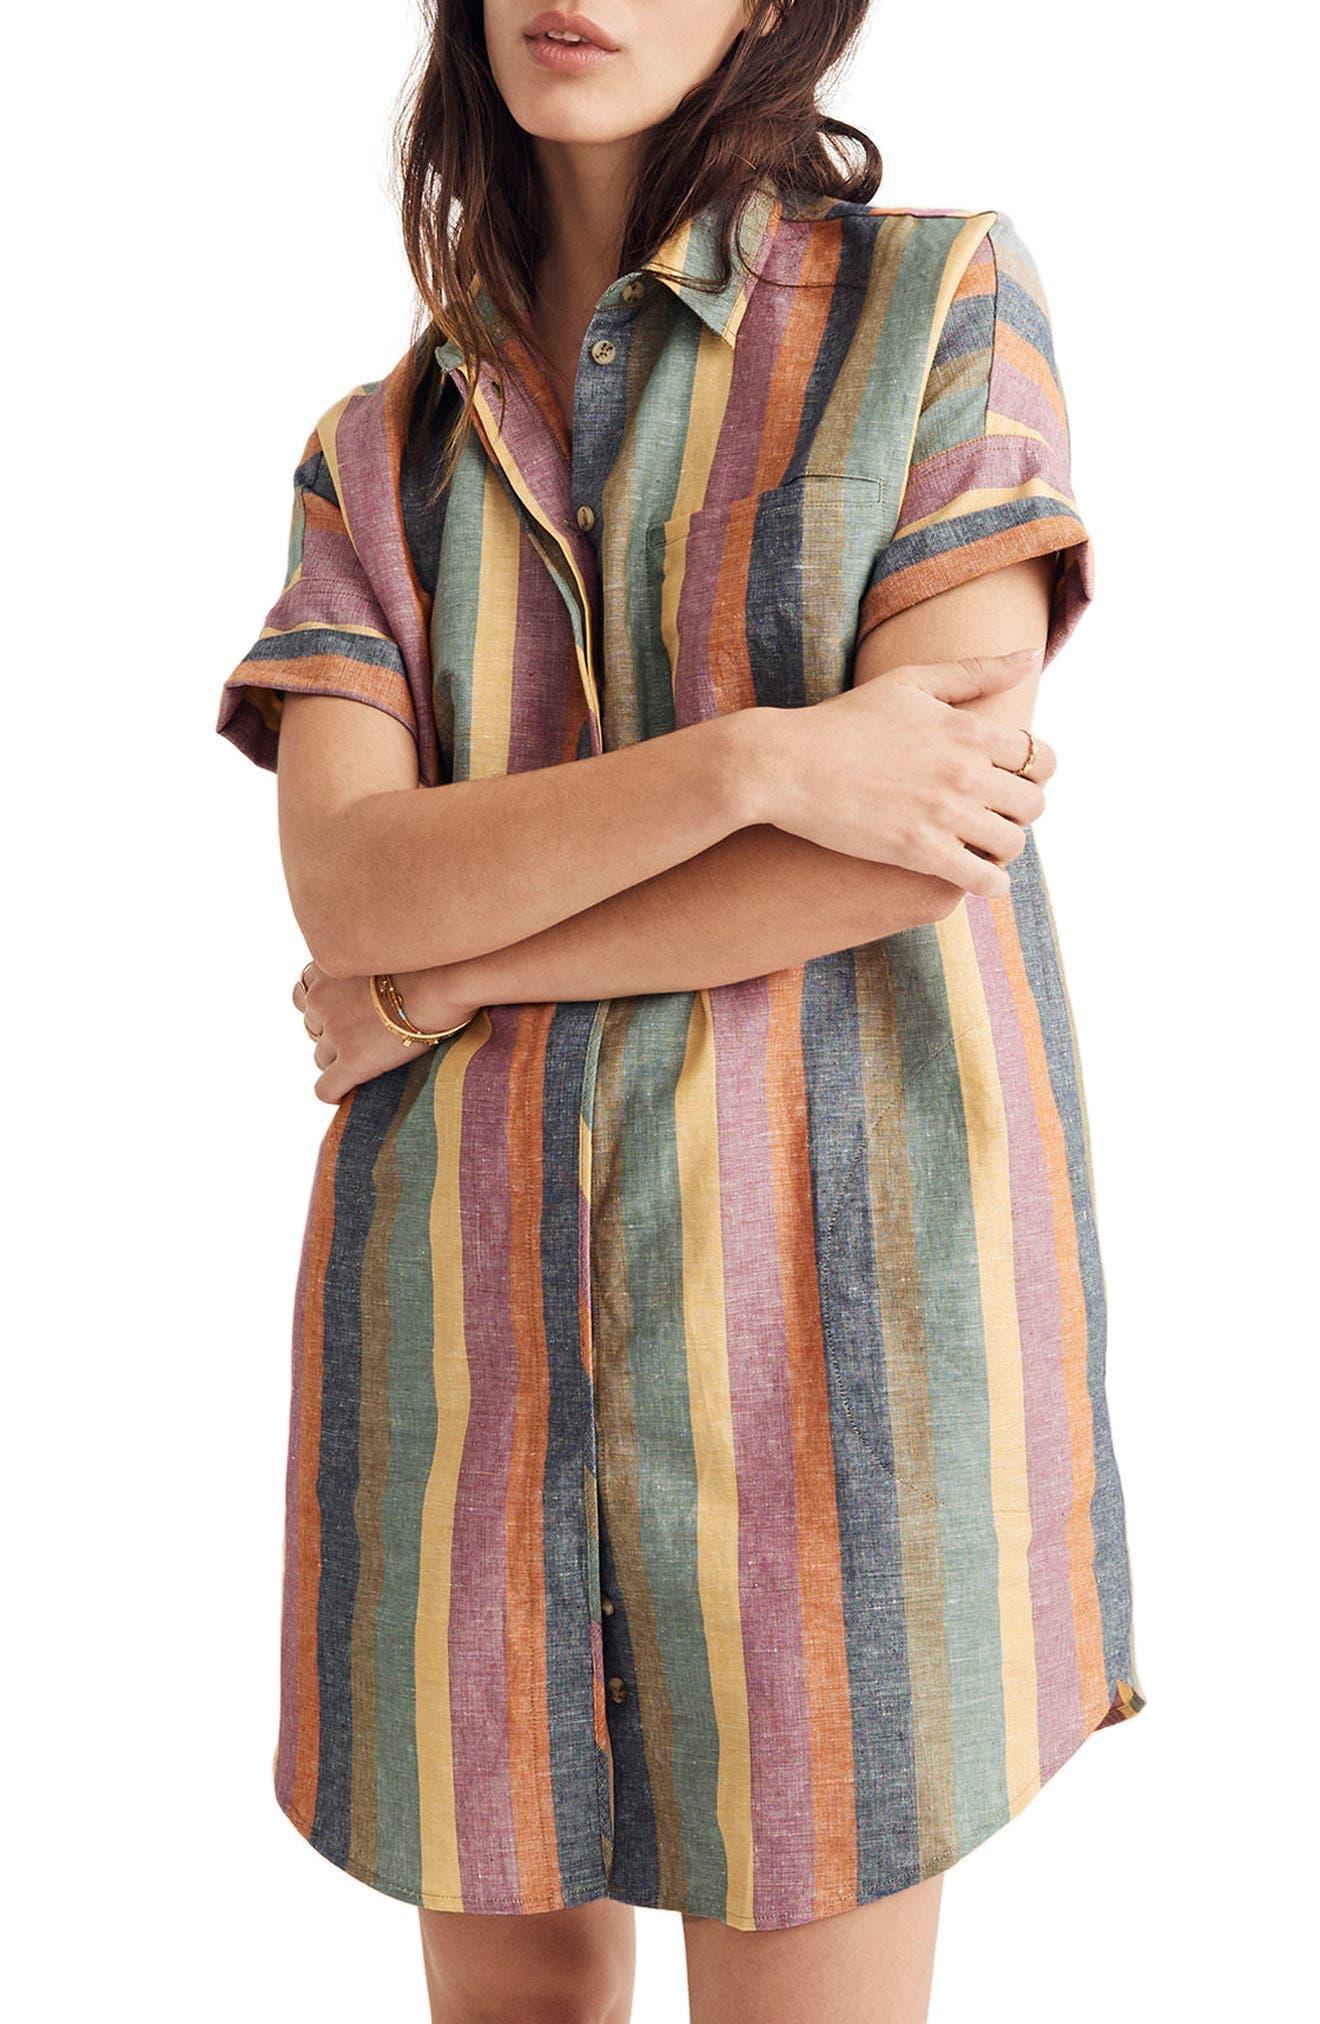 MADEWELL Courier Rainbow Stripe Linen & Cotton Shirtdress, Main, color, 401